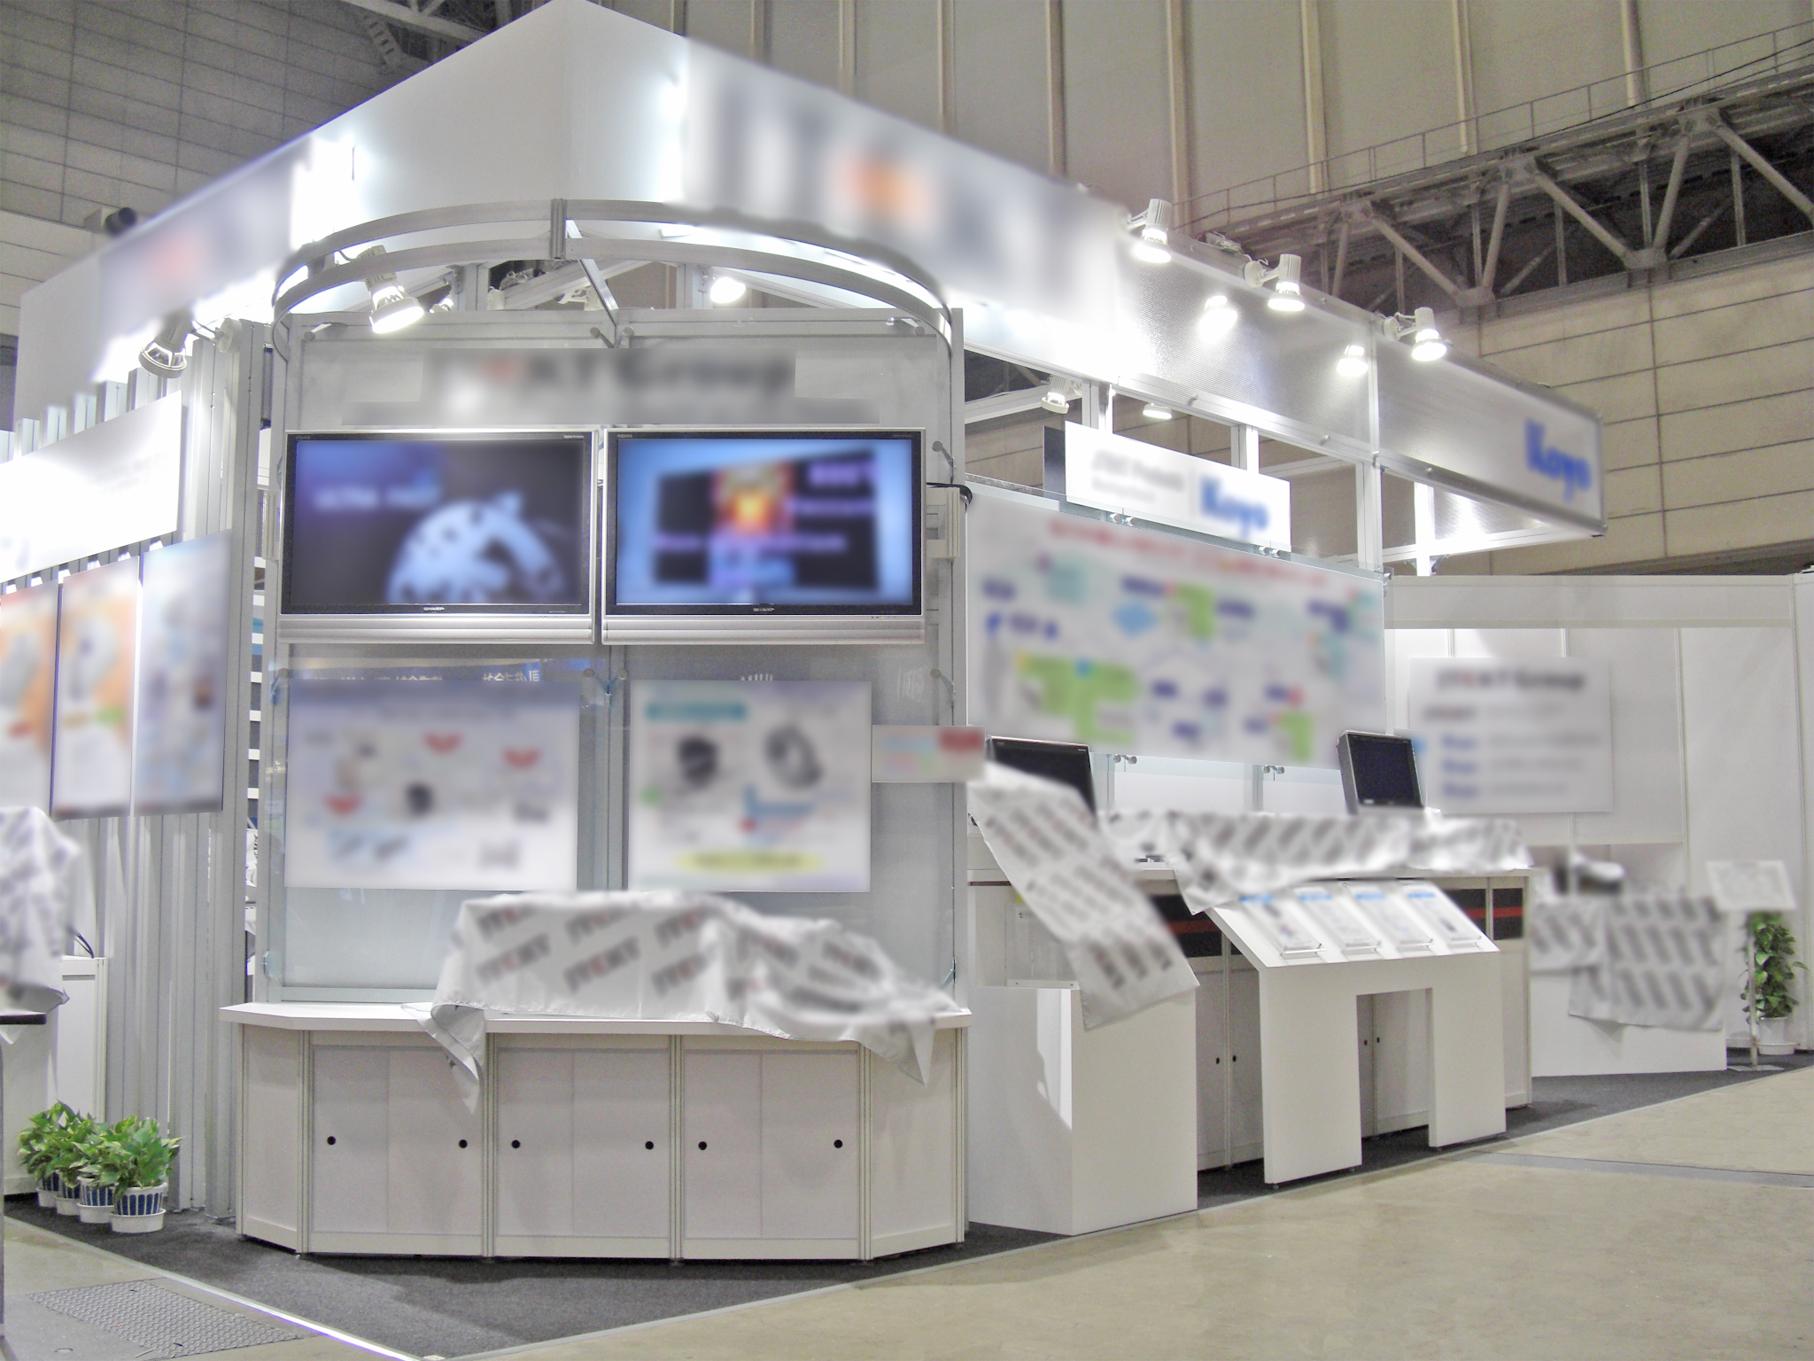 SEMICON Japan 2010 幕張メッセ / 小間(9Mx6M)